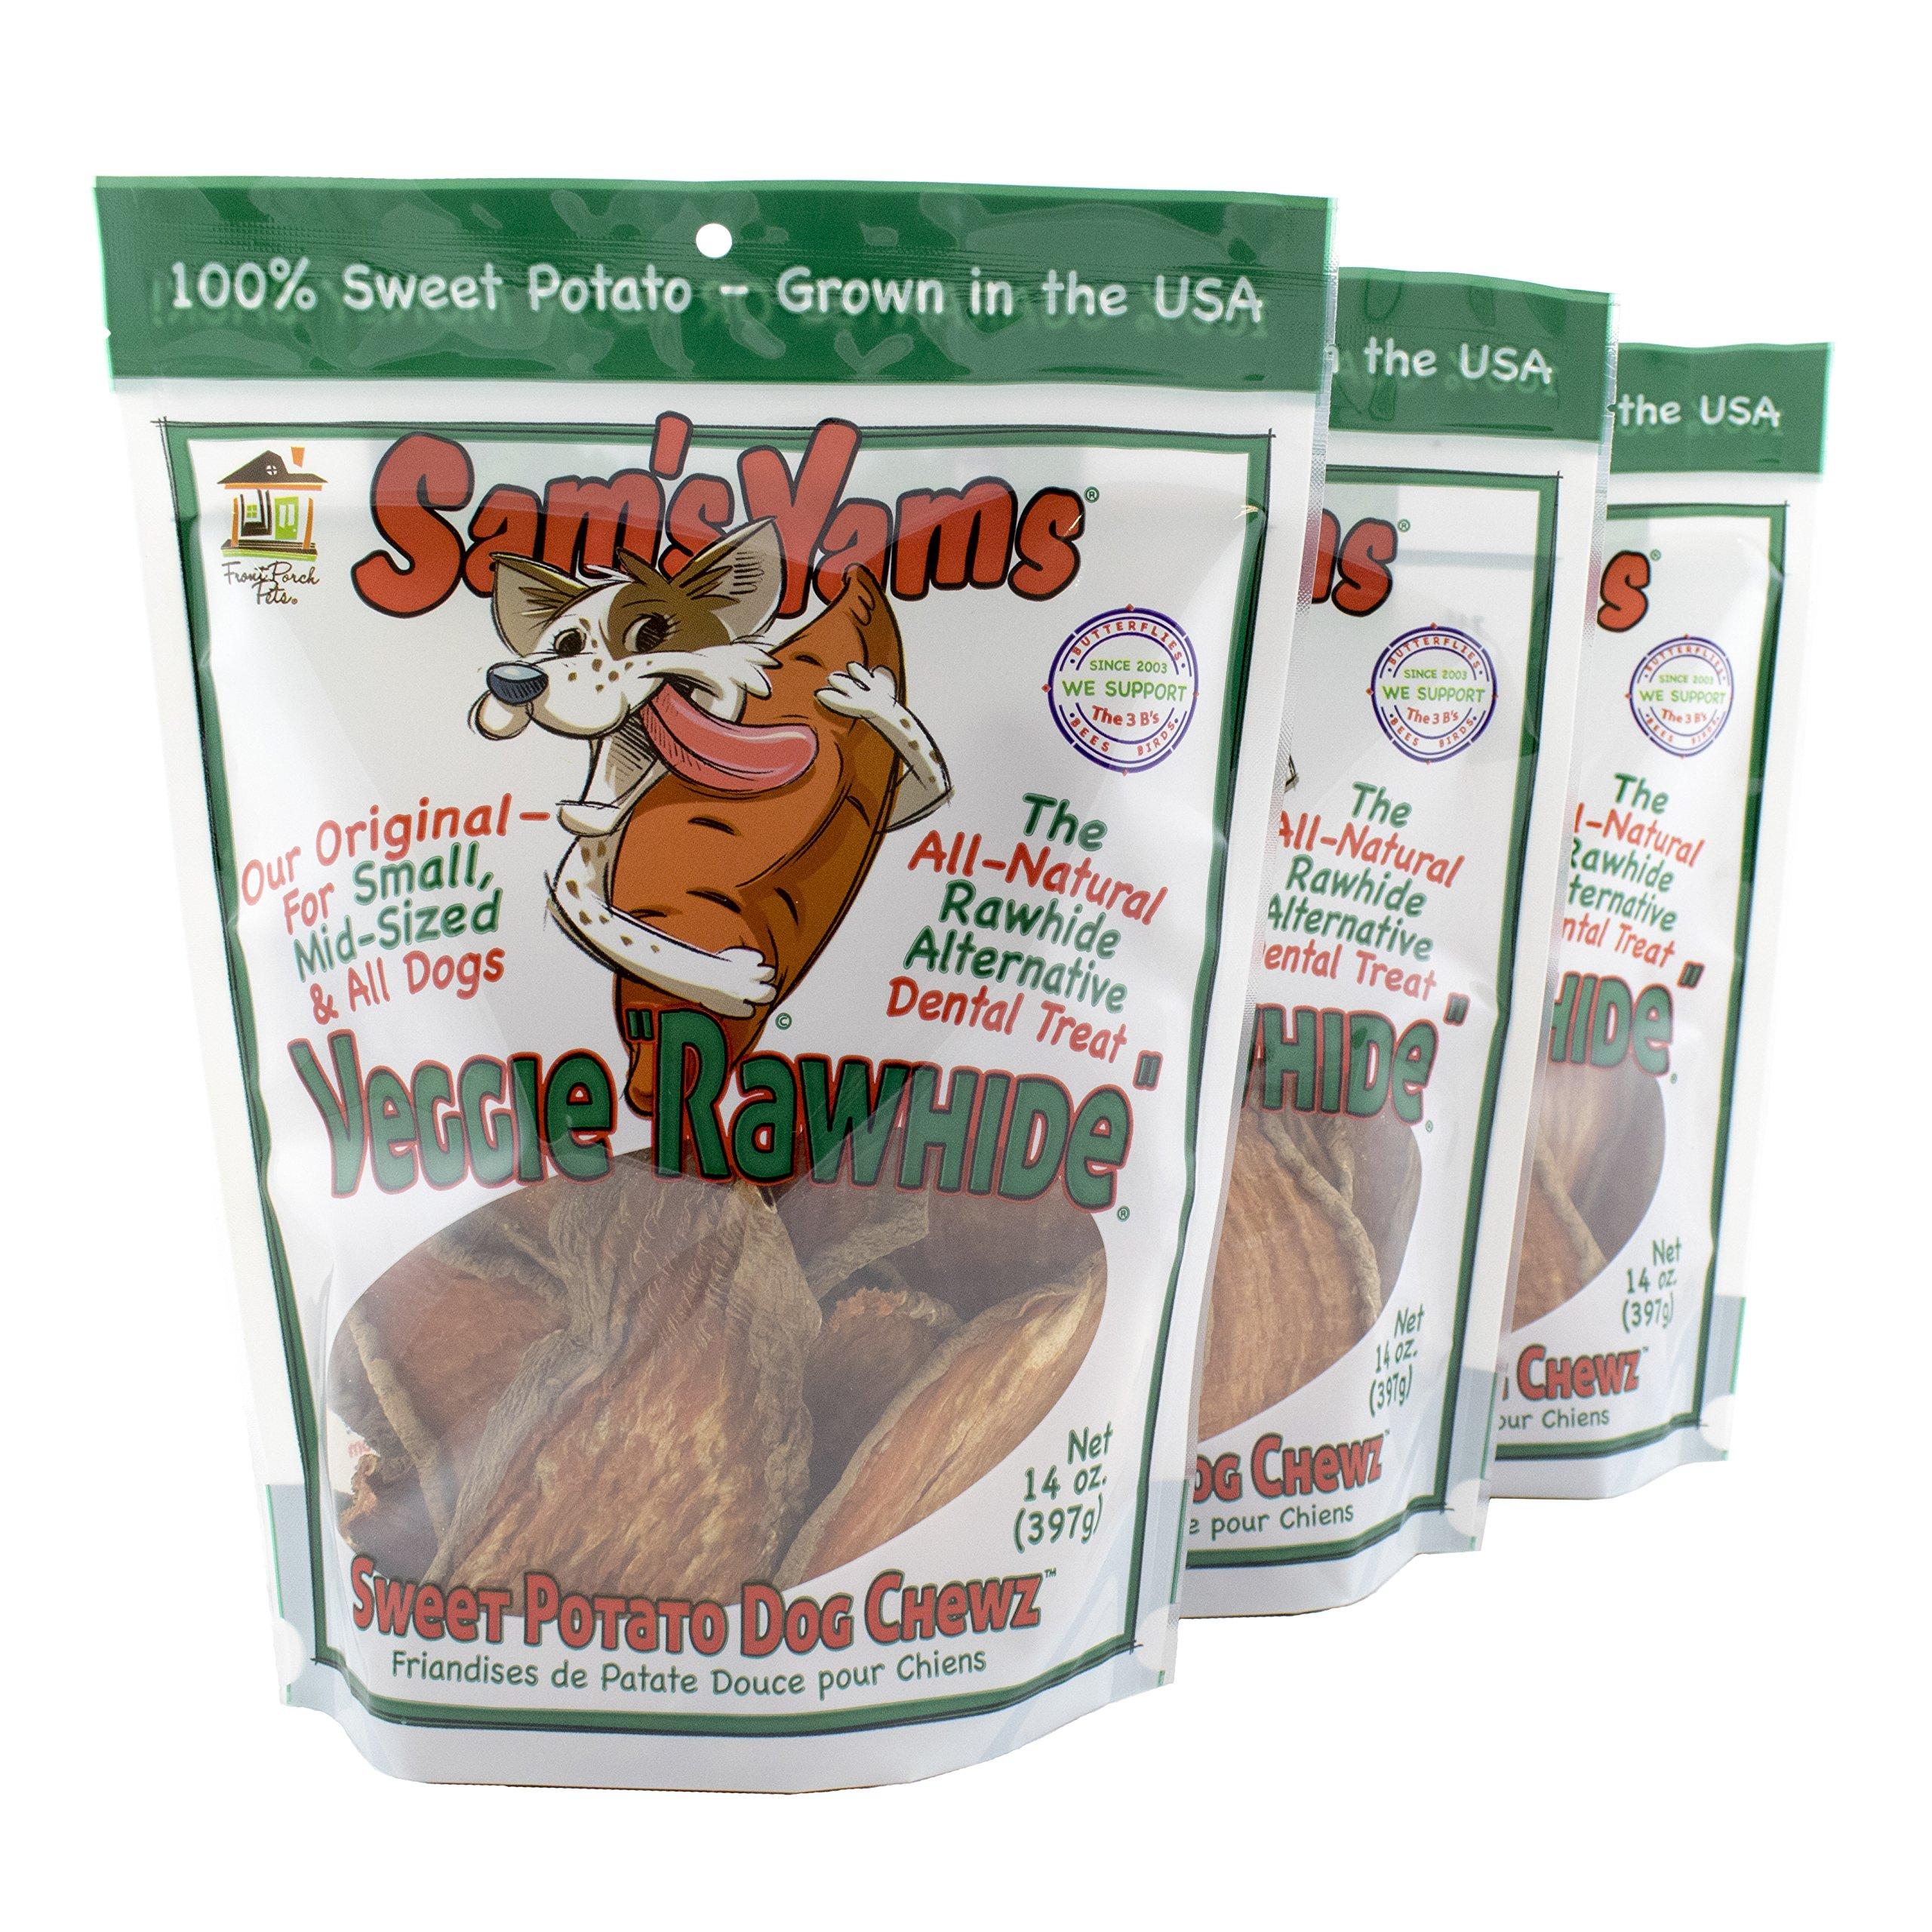 Front Porch Pets Sweet Potato Dog Chewz 14oz bags-Veggie Rawhide,3-Pack